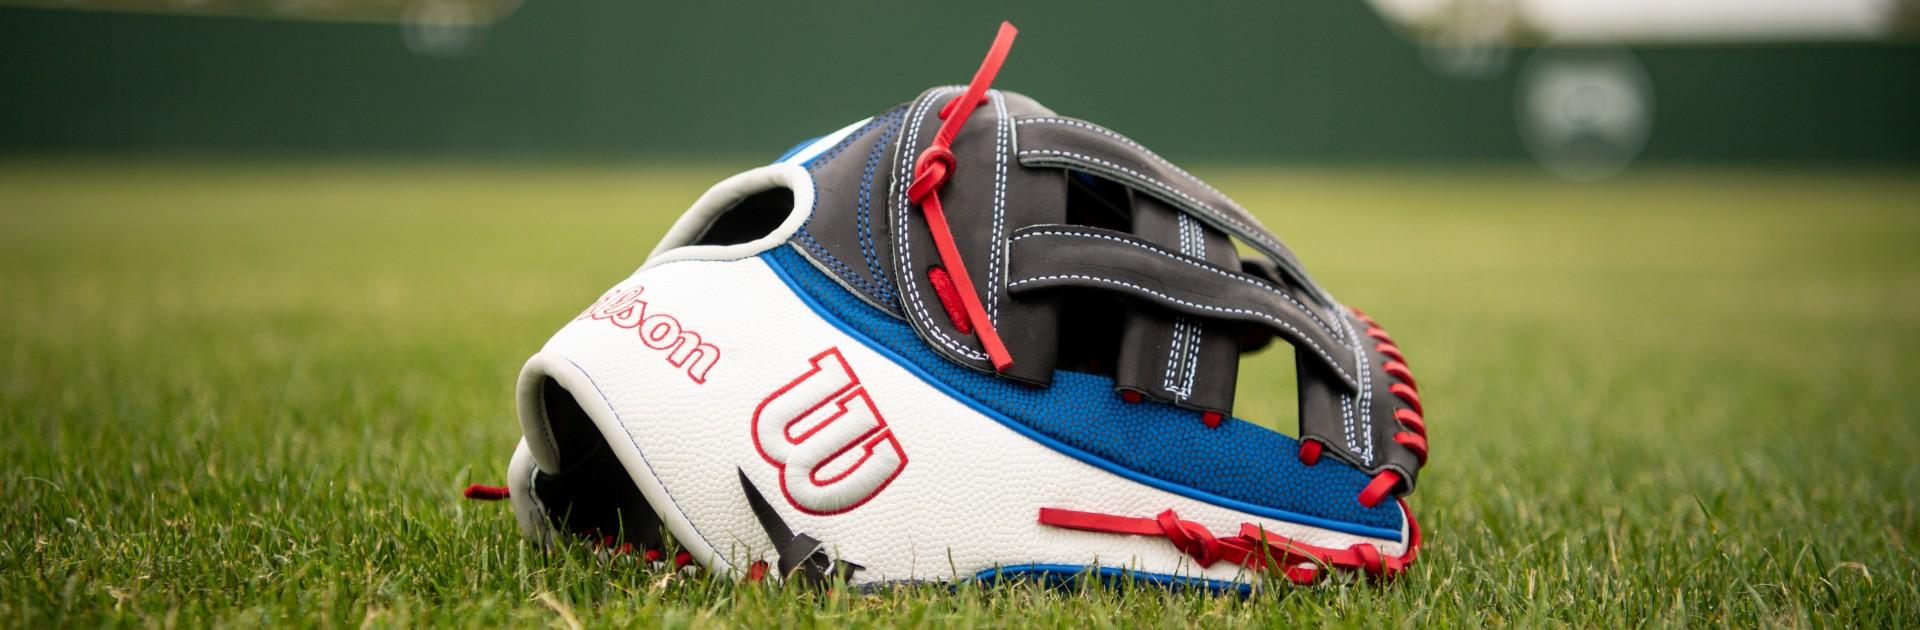 Mookie-Betts-Wilson-Baseball-Glove-A2K-MB50-SuperSkin